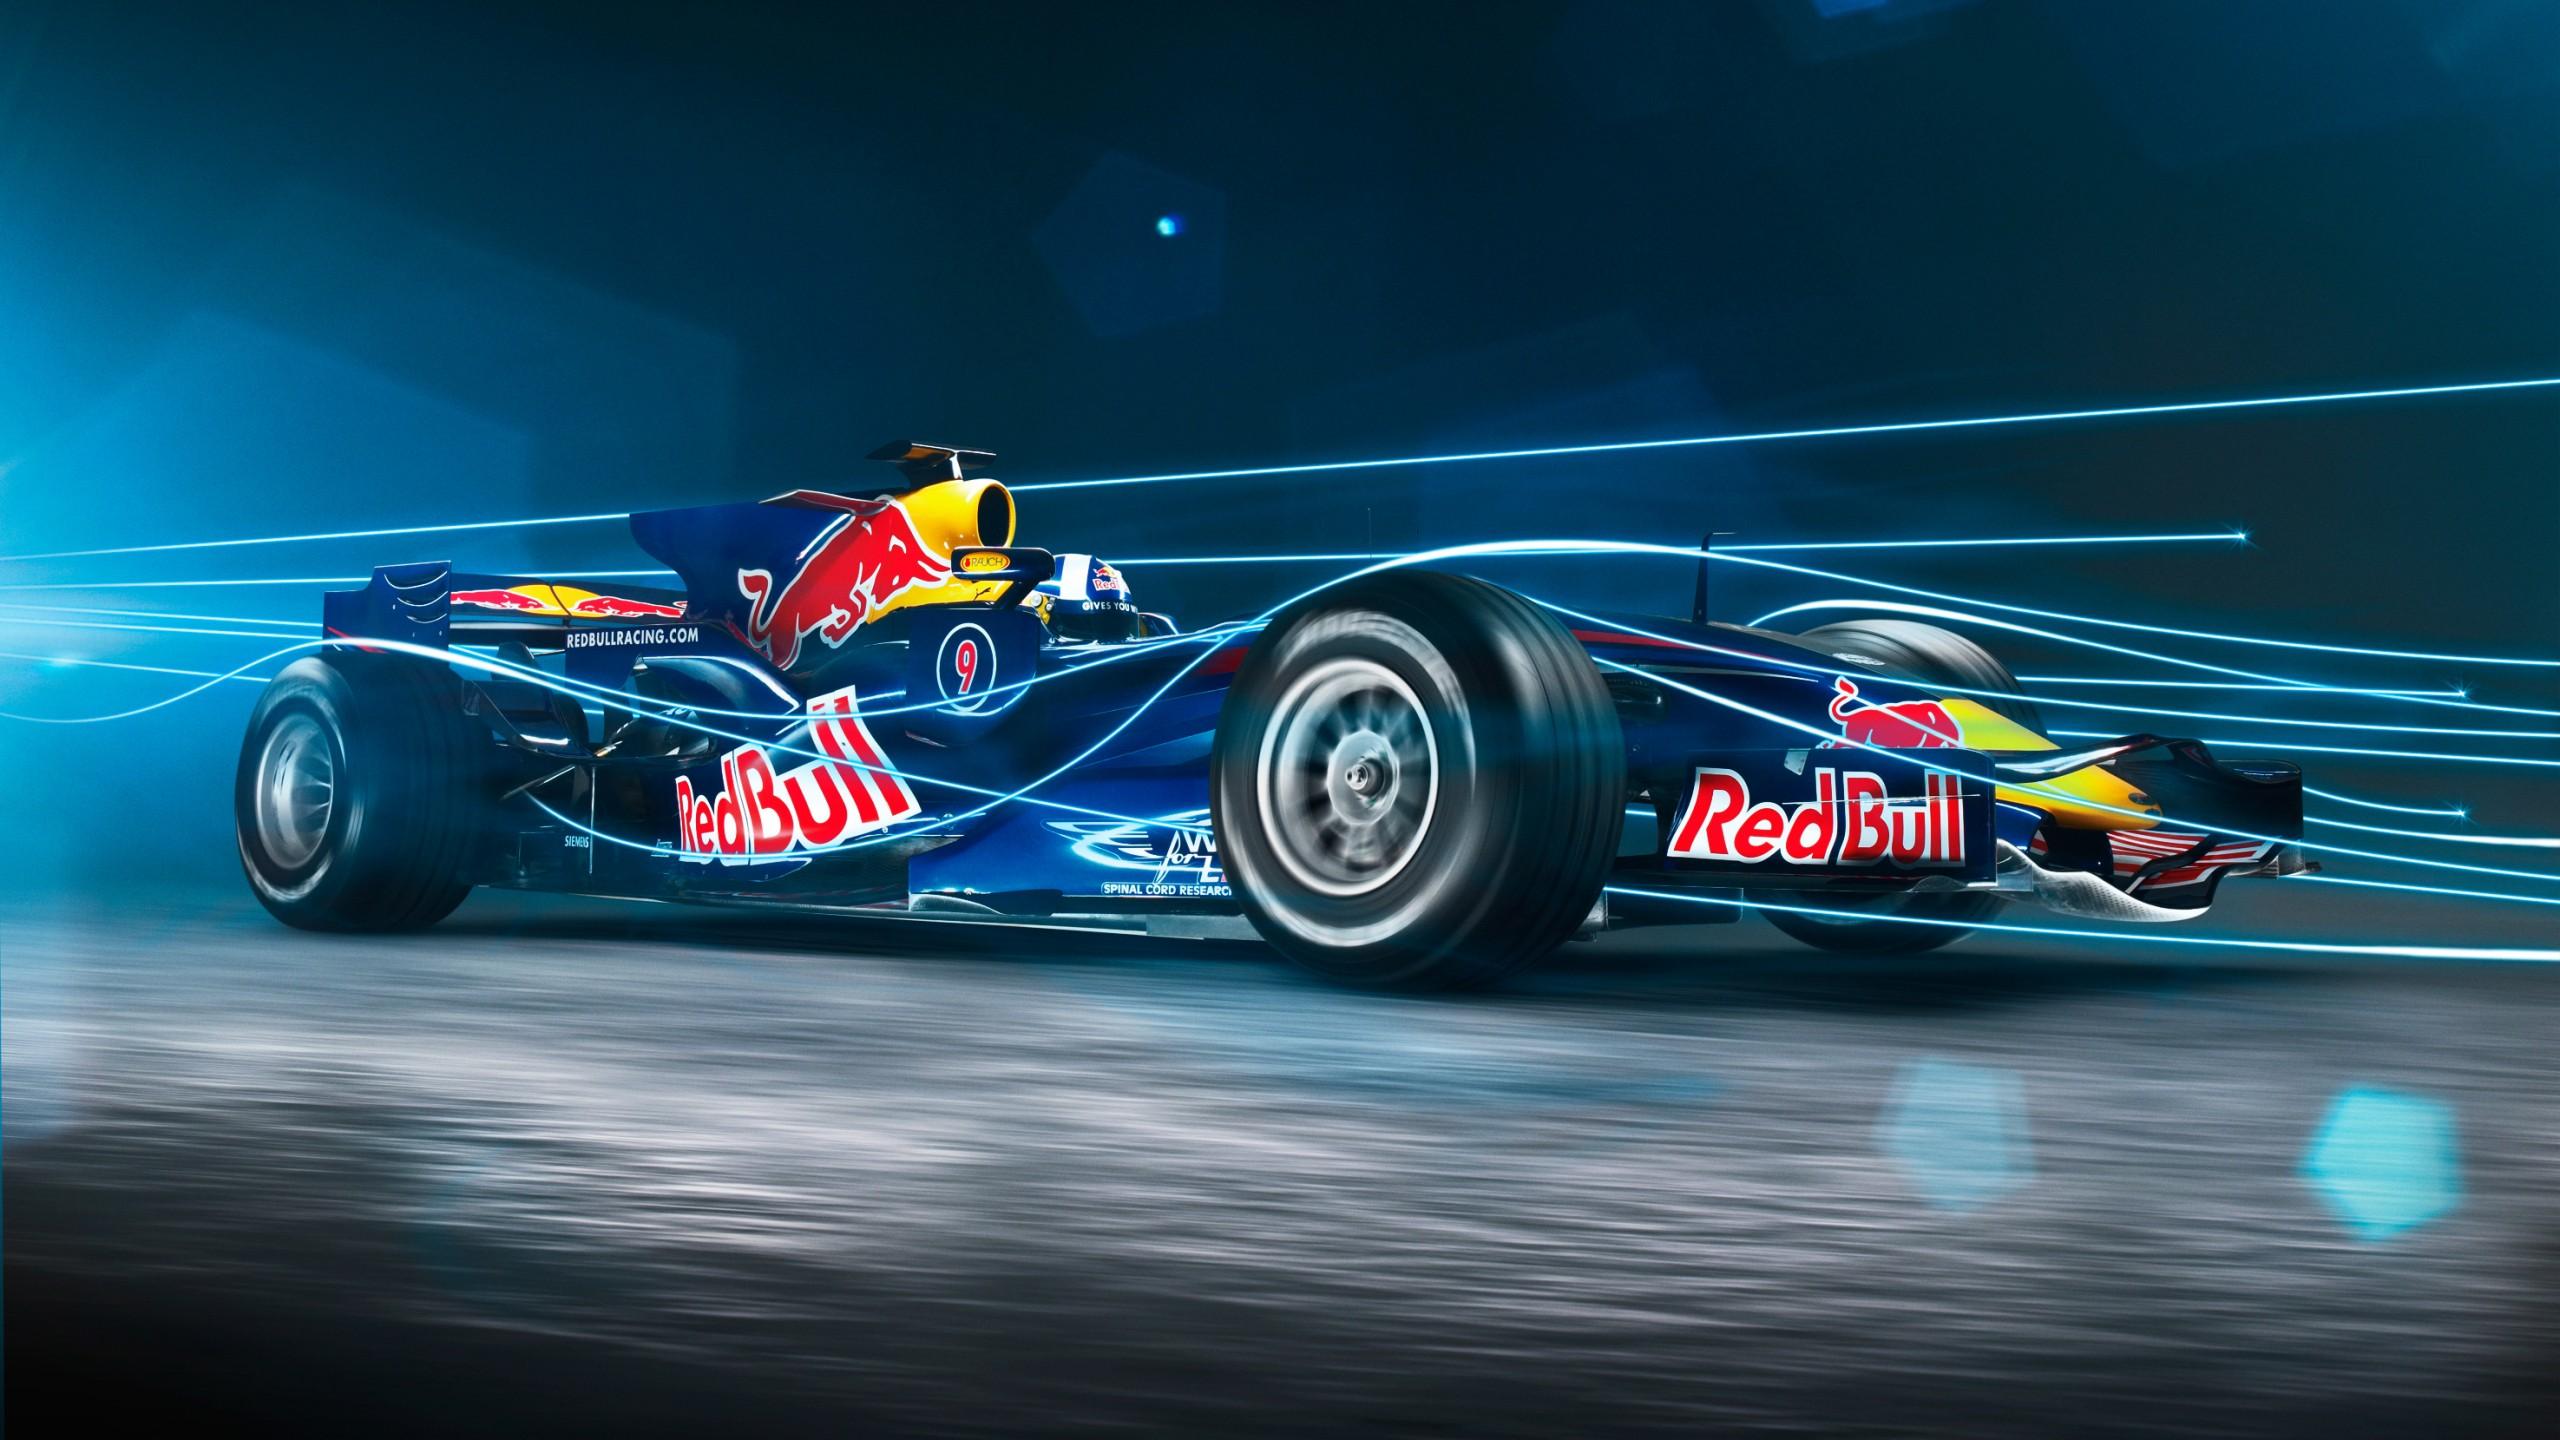 Red Bull Racing F1 HD Wallpaper